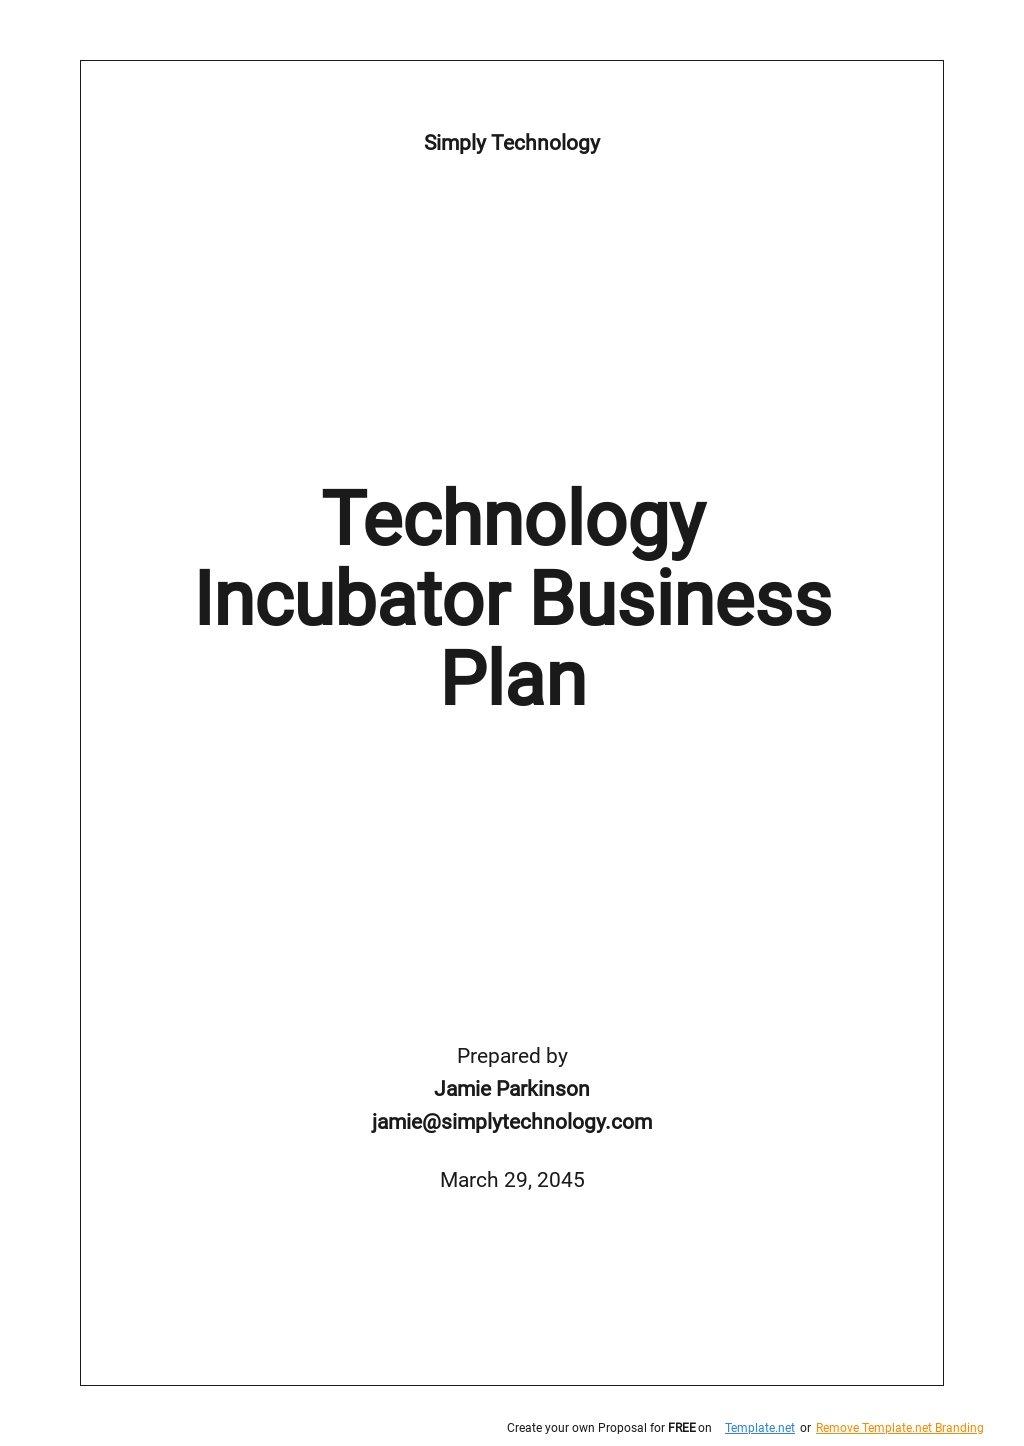 Technology Incubator Business Plan Template.jpe